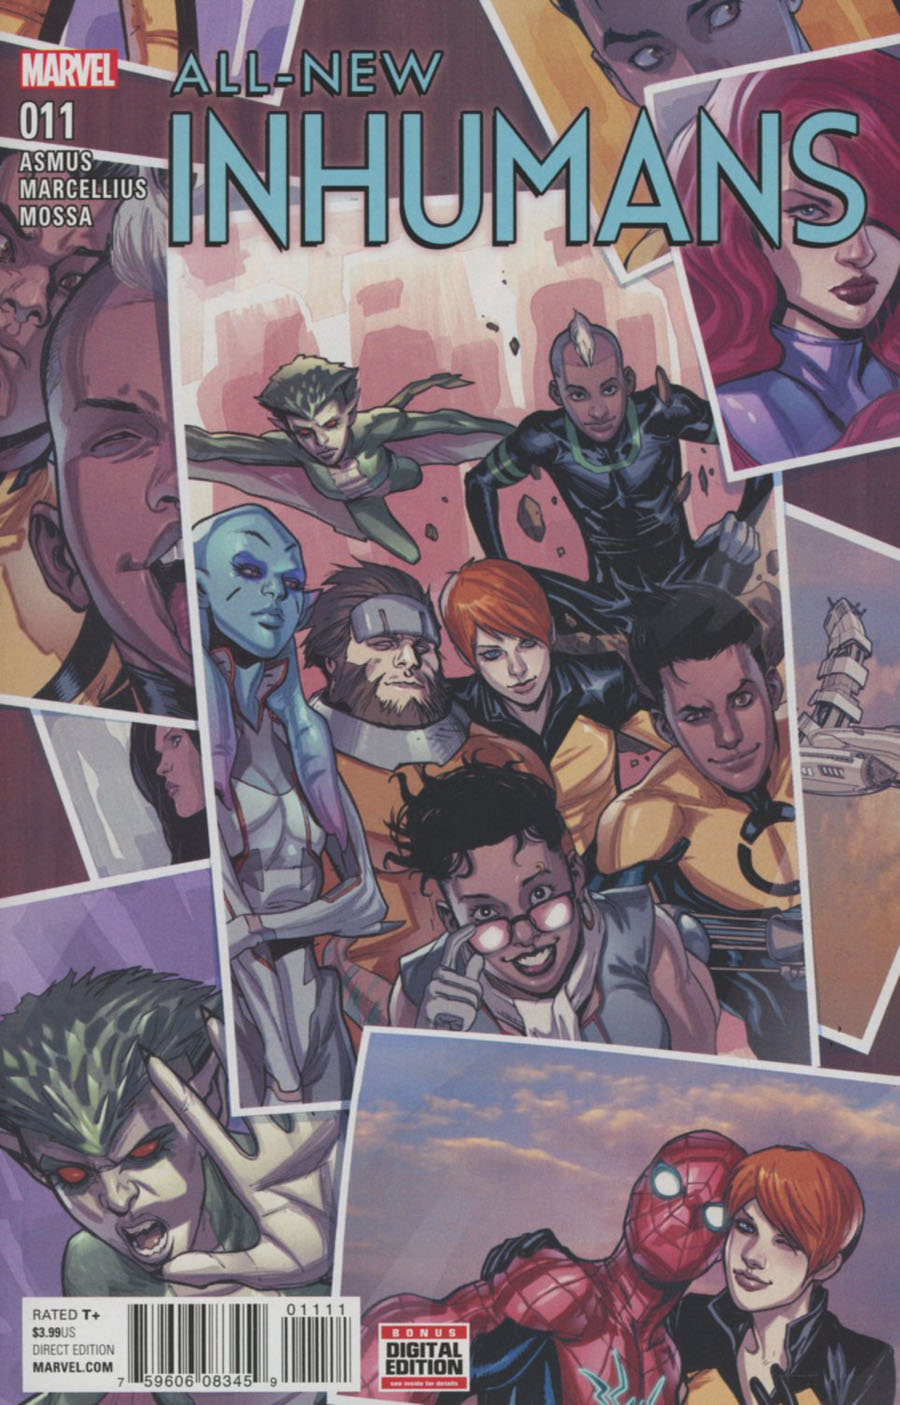 All-New Inhumans #11